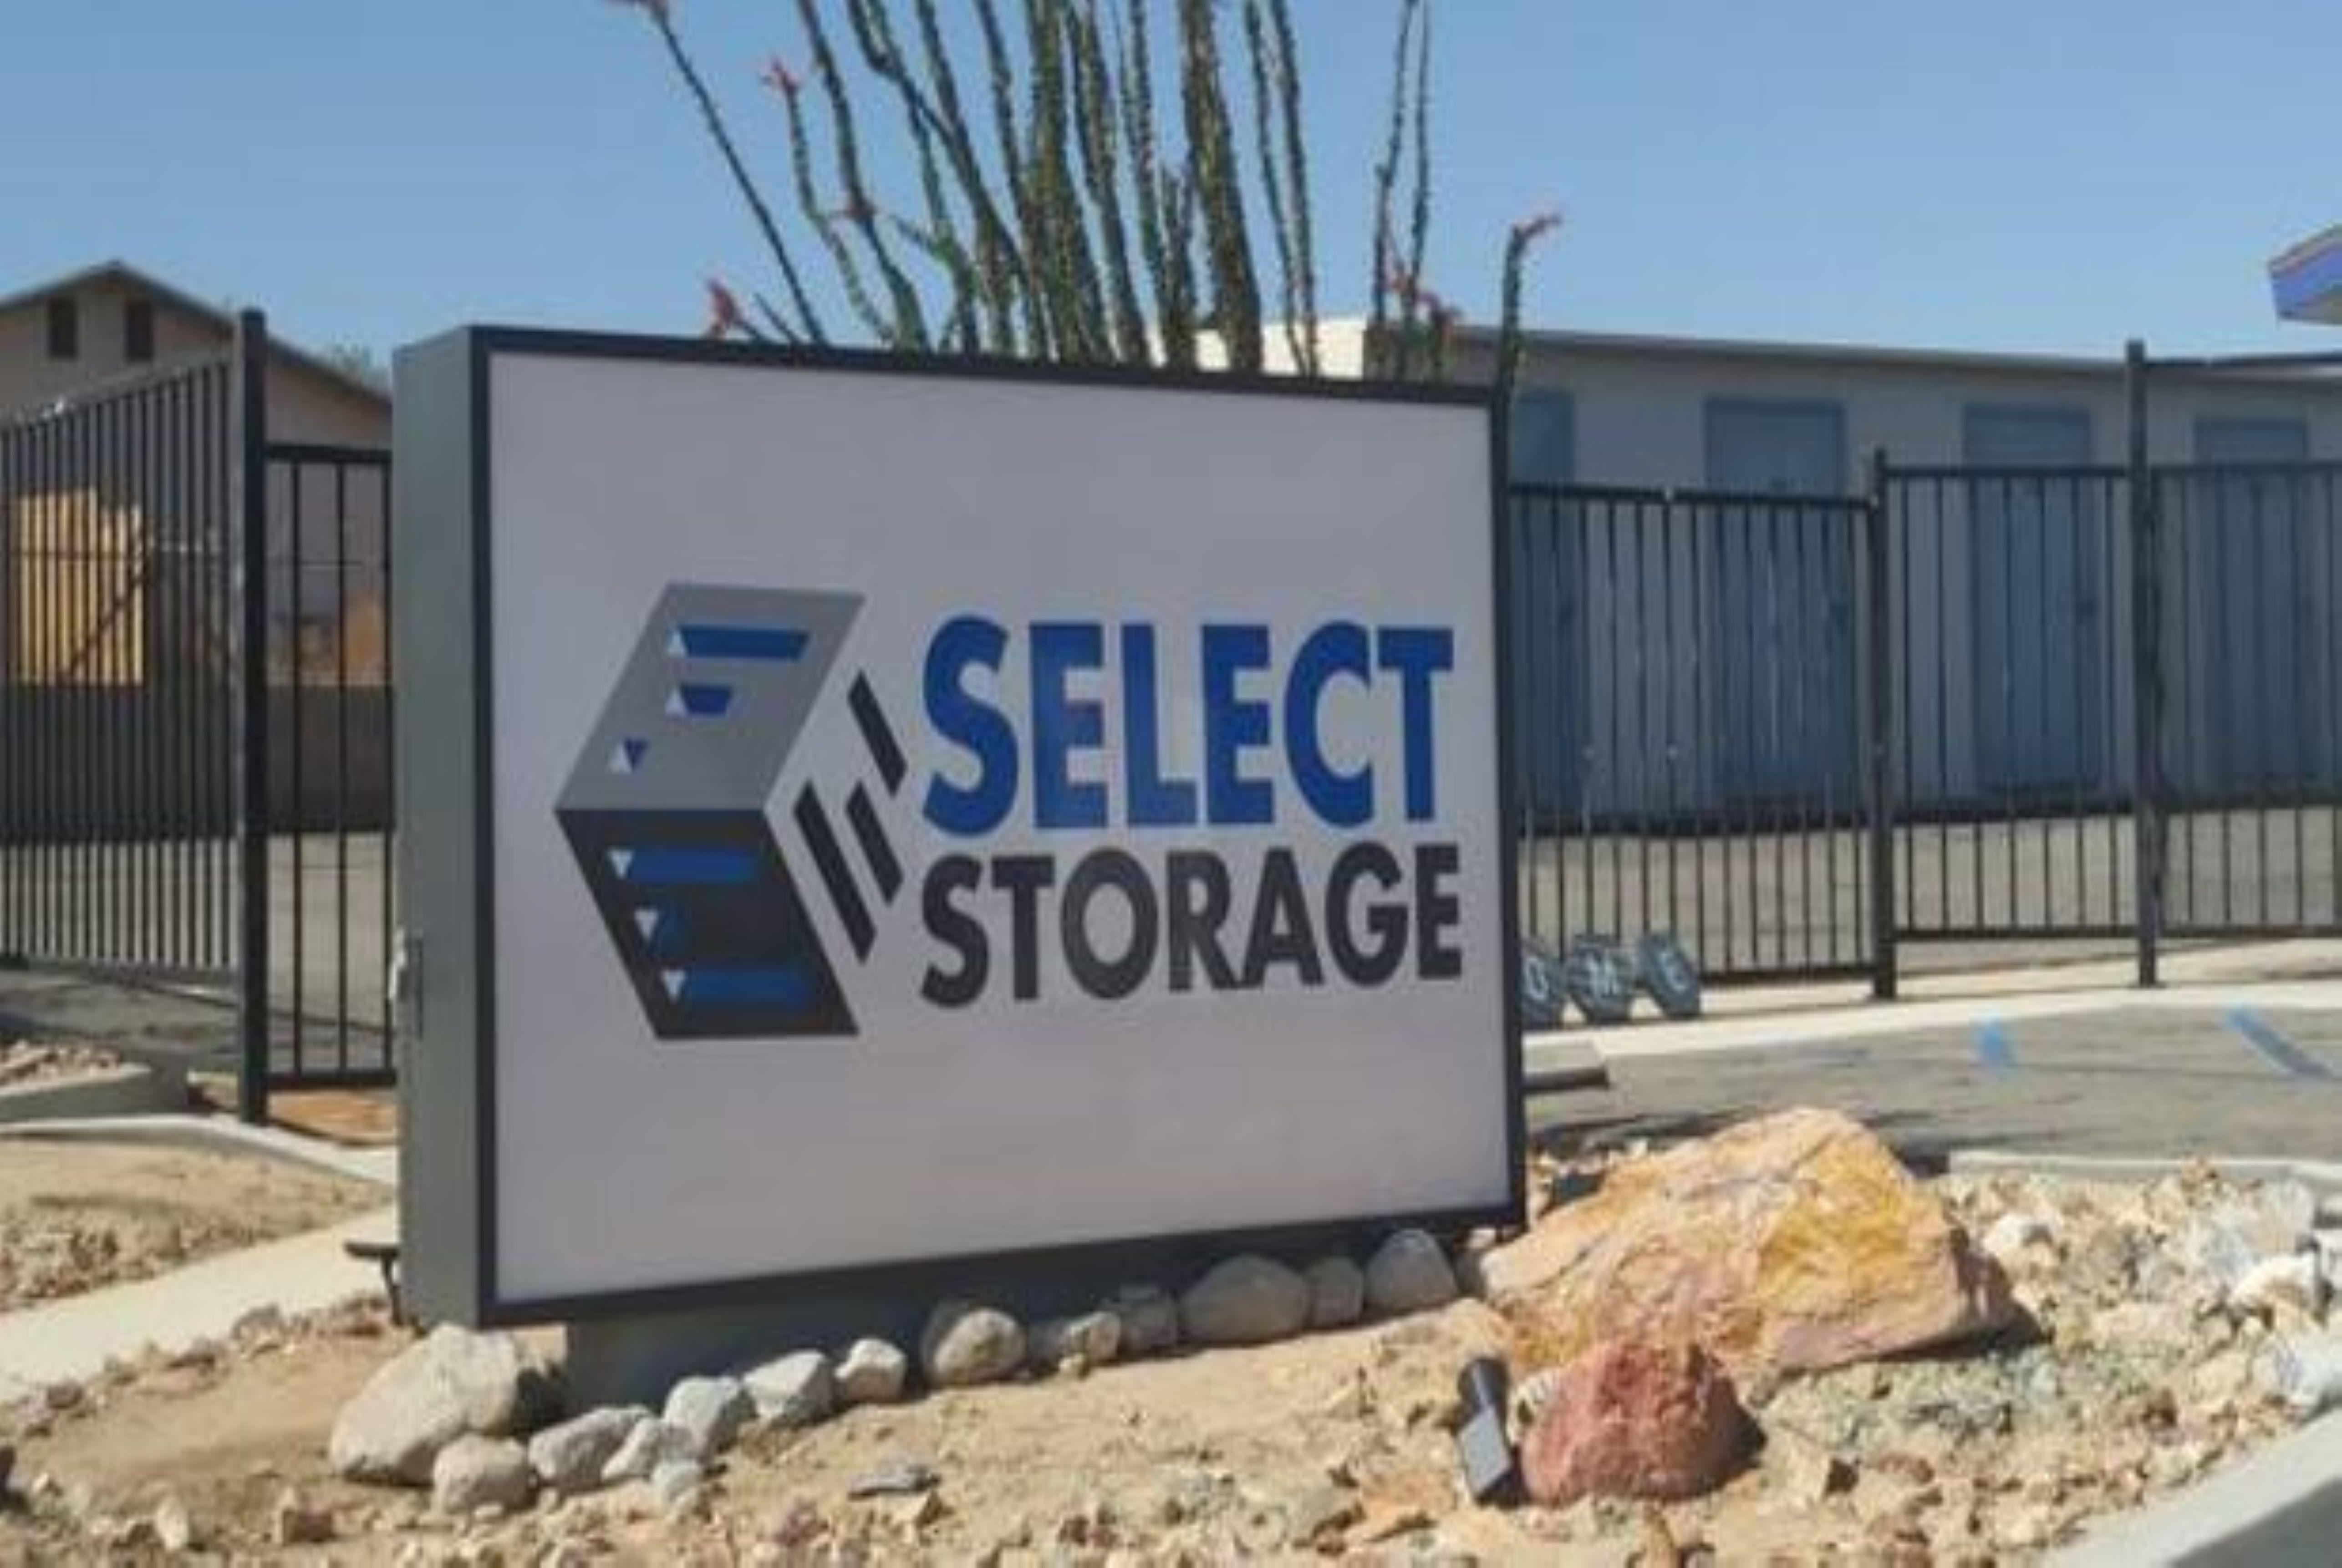 Select Storage Sign in Twentynine Palms, CA